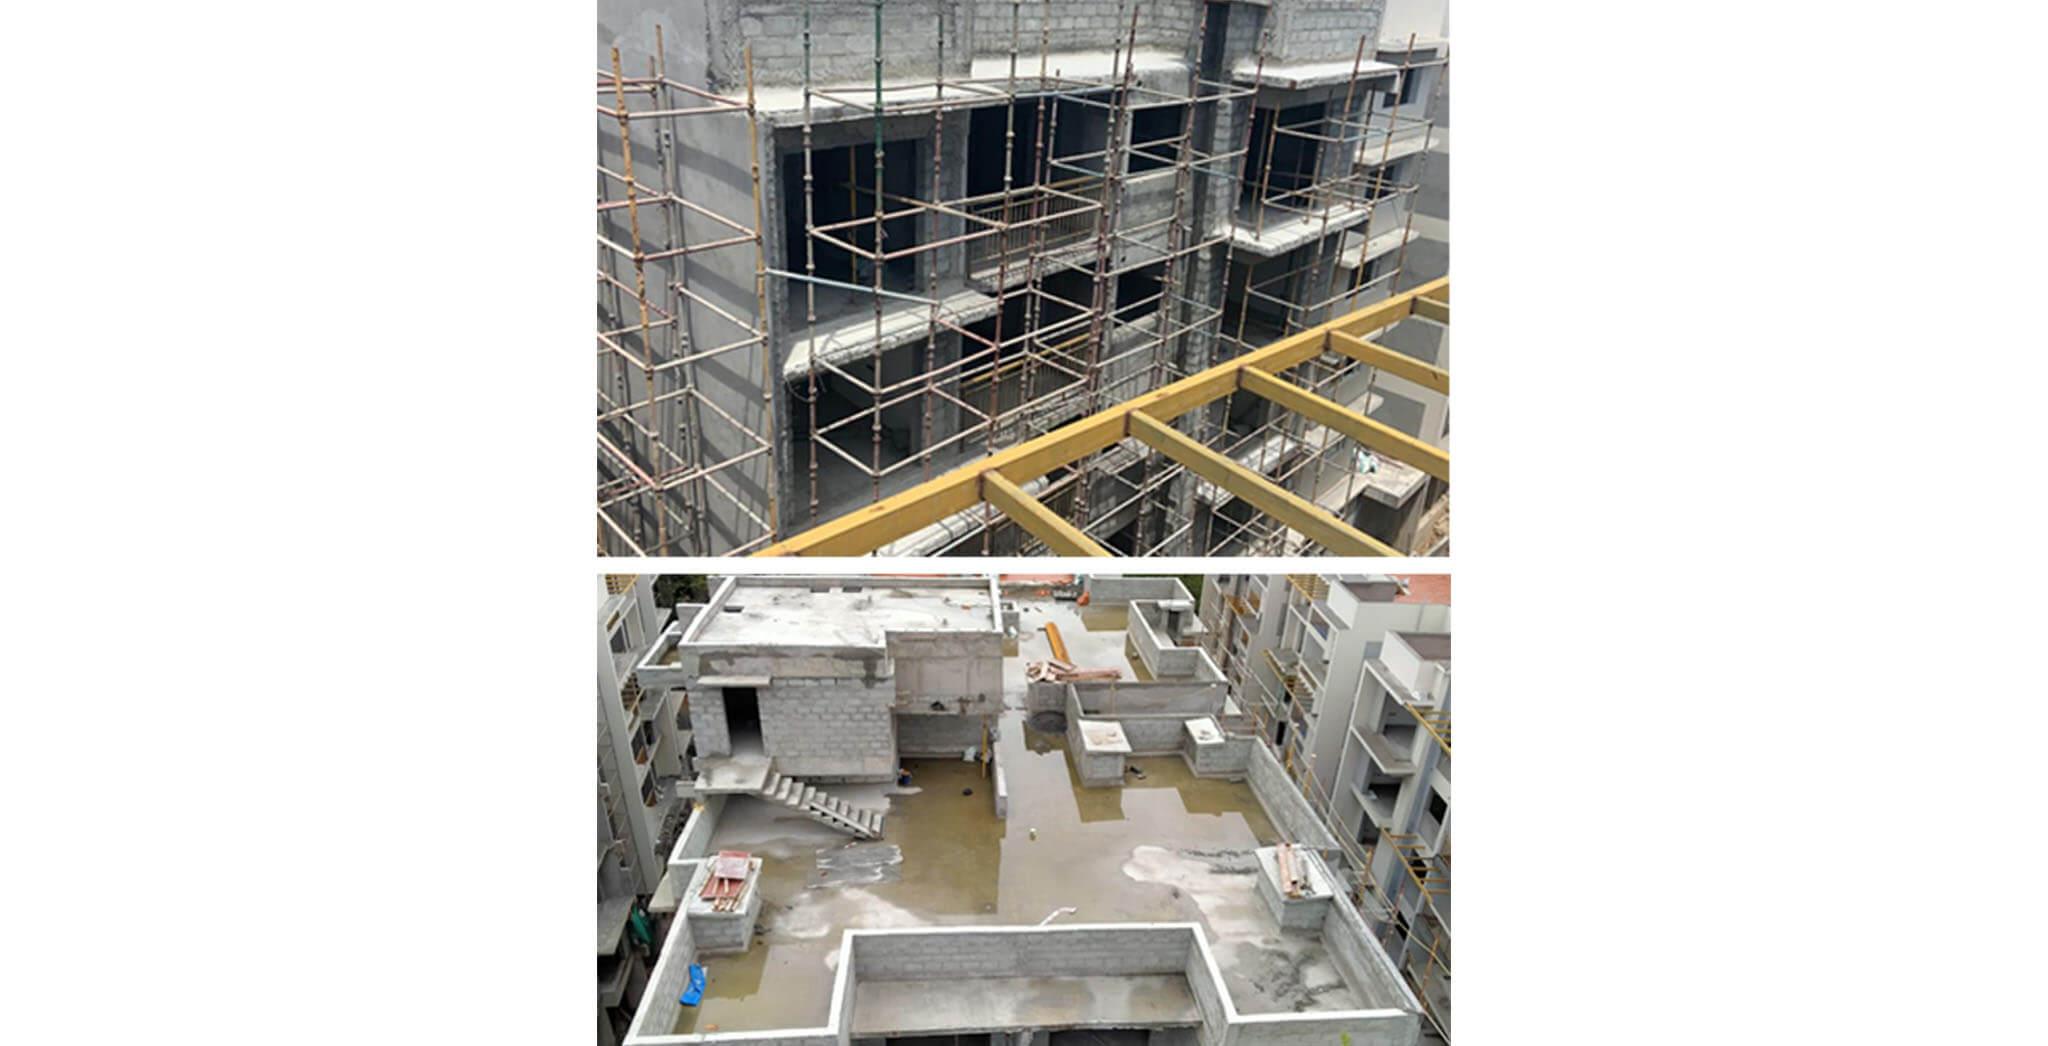 May 2021 - S Block: North elevation flat-66 series chajja waterproofing & external plastering, and Lift pit waterproofing works completed; North elevation flat-65 series chajja waterproofing, Terrace floor waterproofing testing, North elevation Balcony railing, and LMR internal plastering work-in-progress.